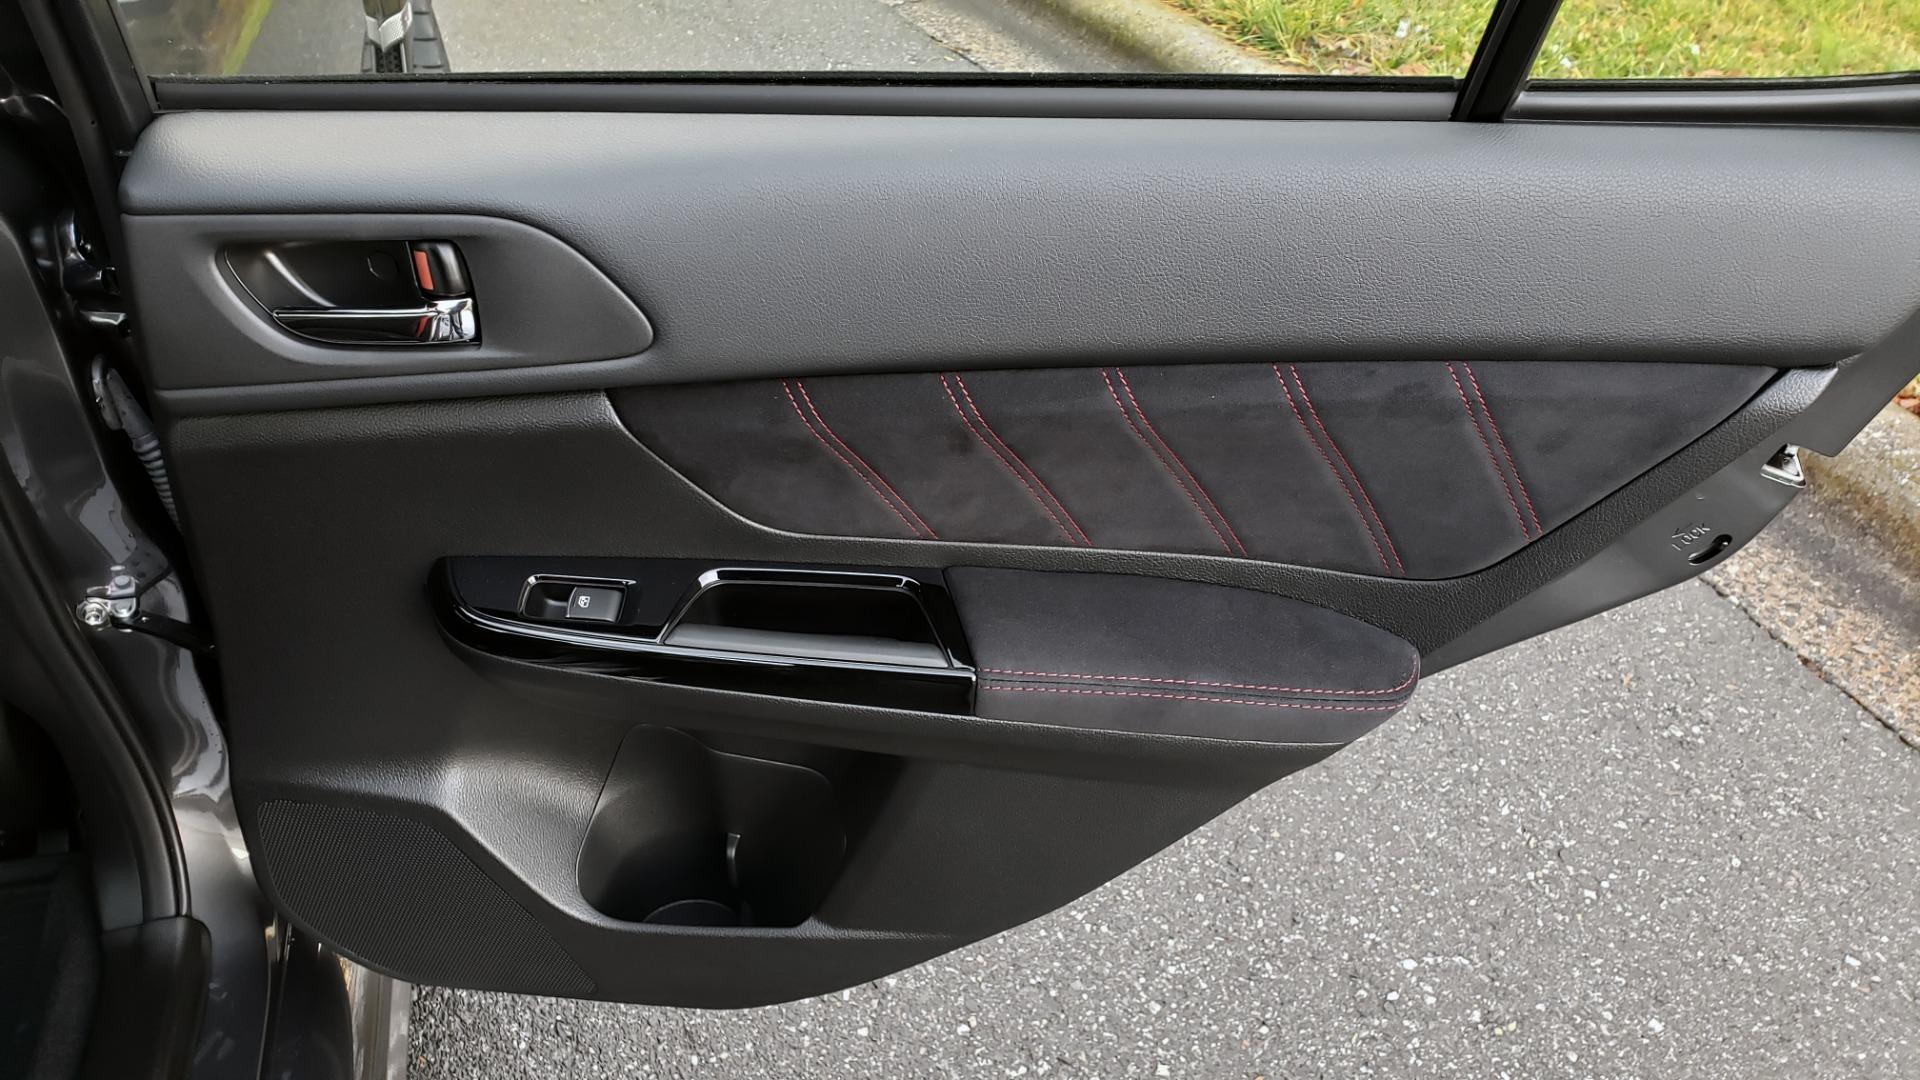 Used 2020 Subaru WRX STI 2.5L TURBO / 6-SPEED MANUAL / RECARO SEATS / REARVIEW for sale Sold at Formula Imports in Charlotte NC 28227 80